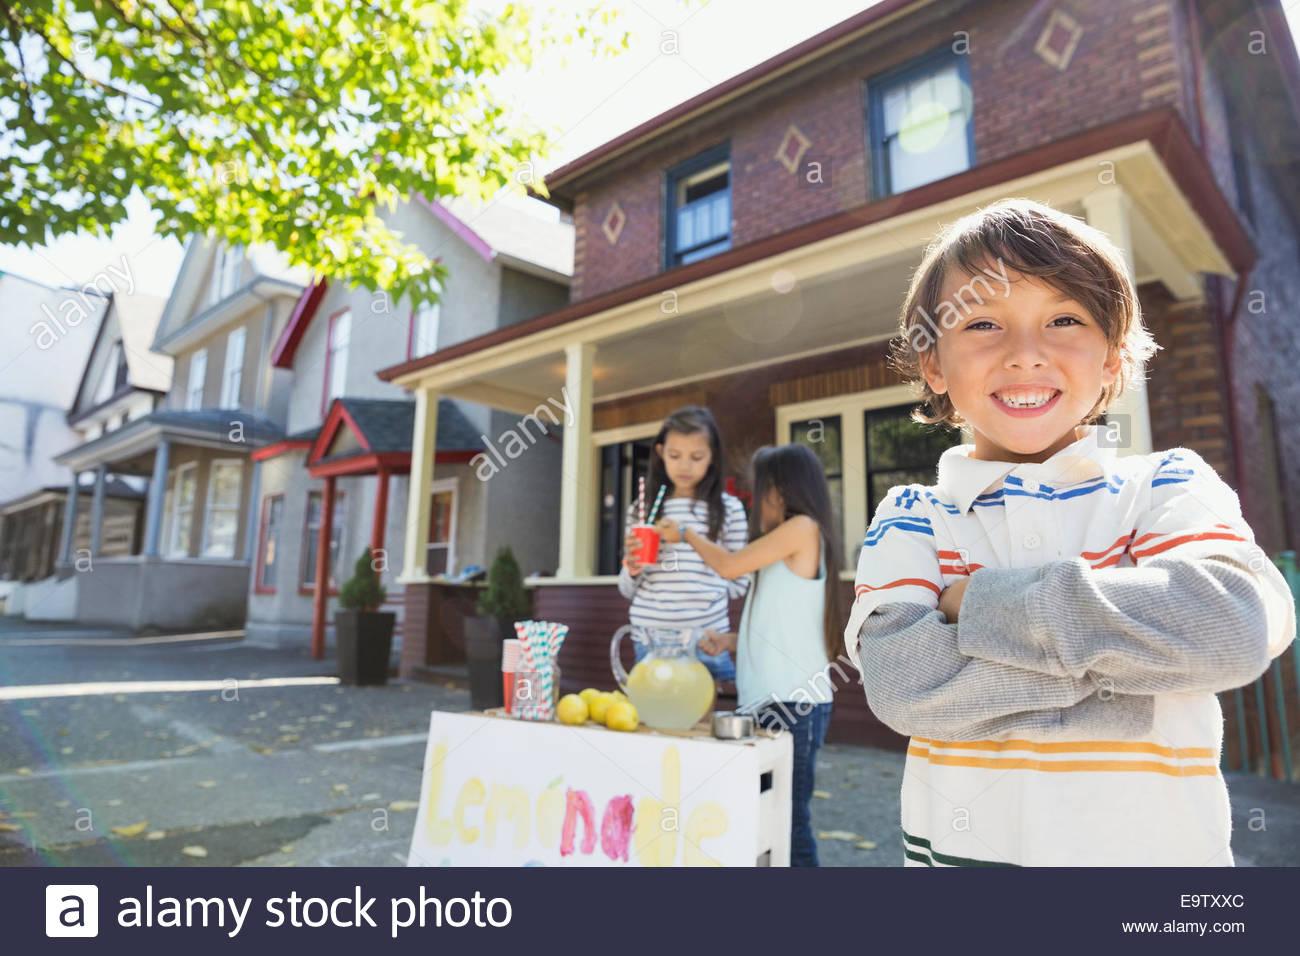 Portrait of confident boy at lemonade stand - Stock Image